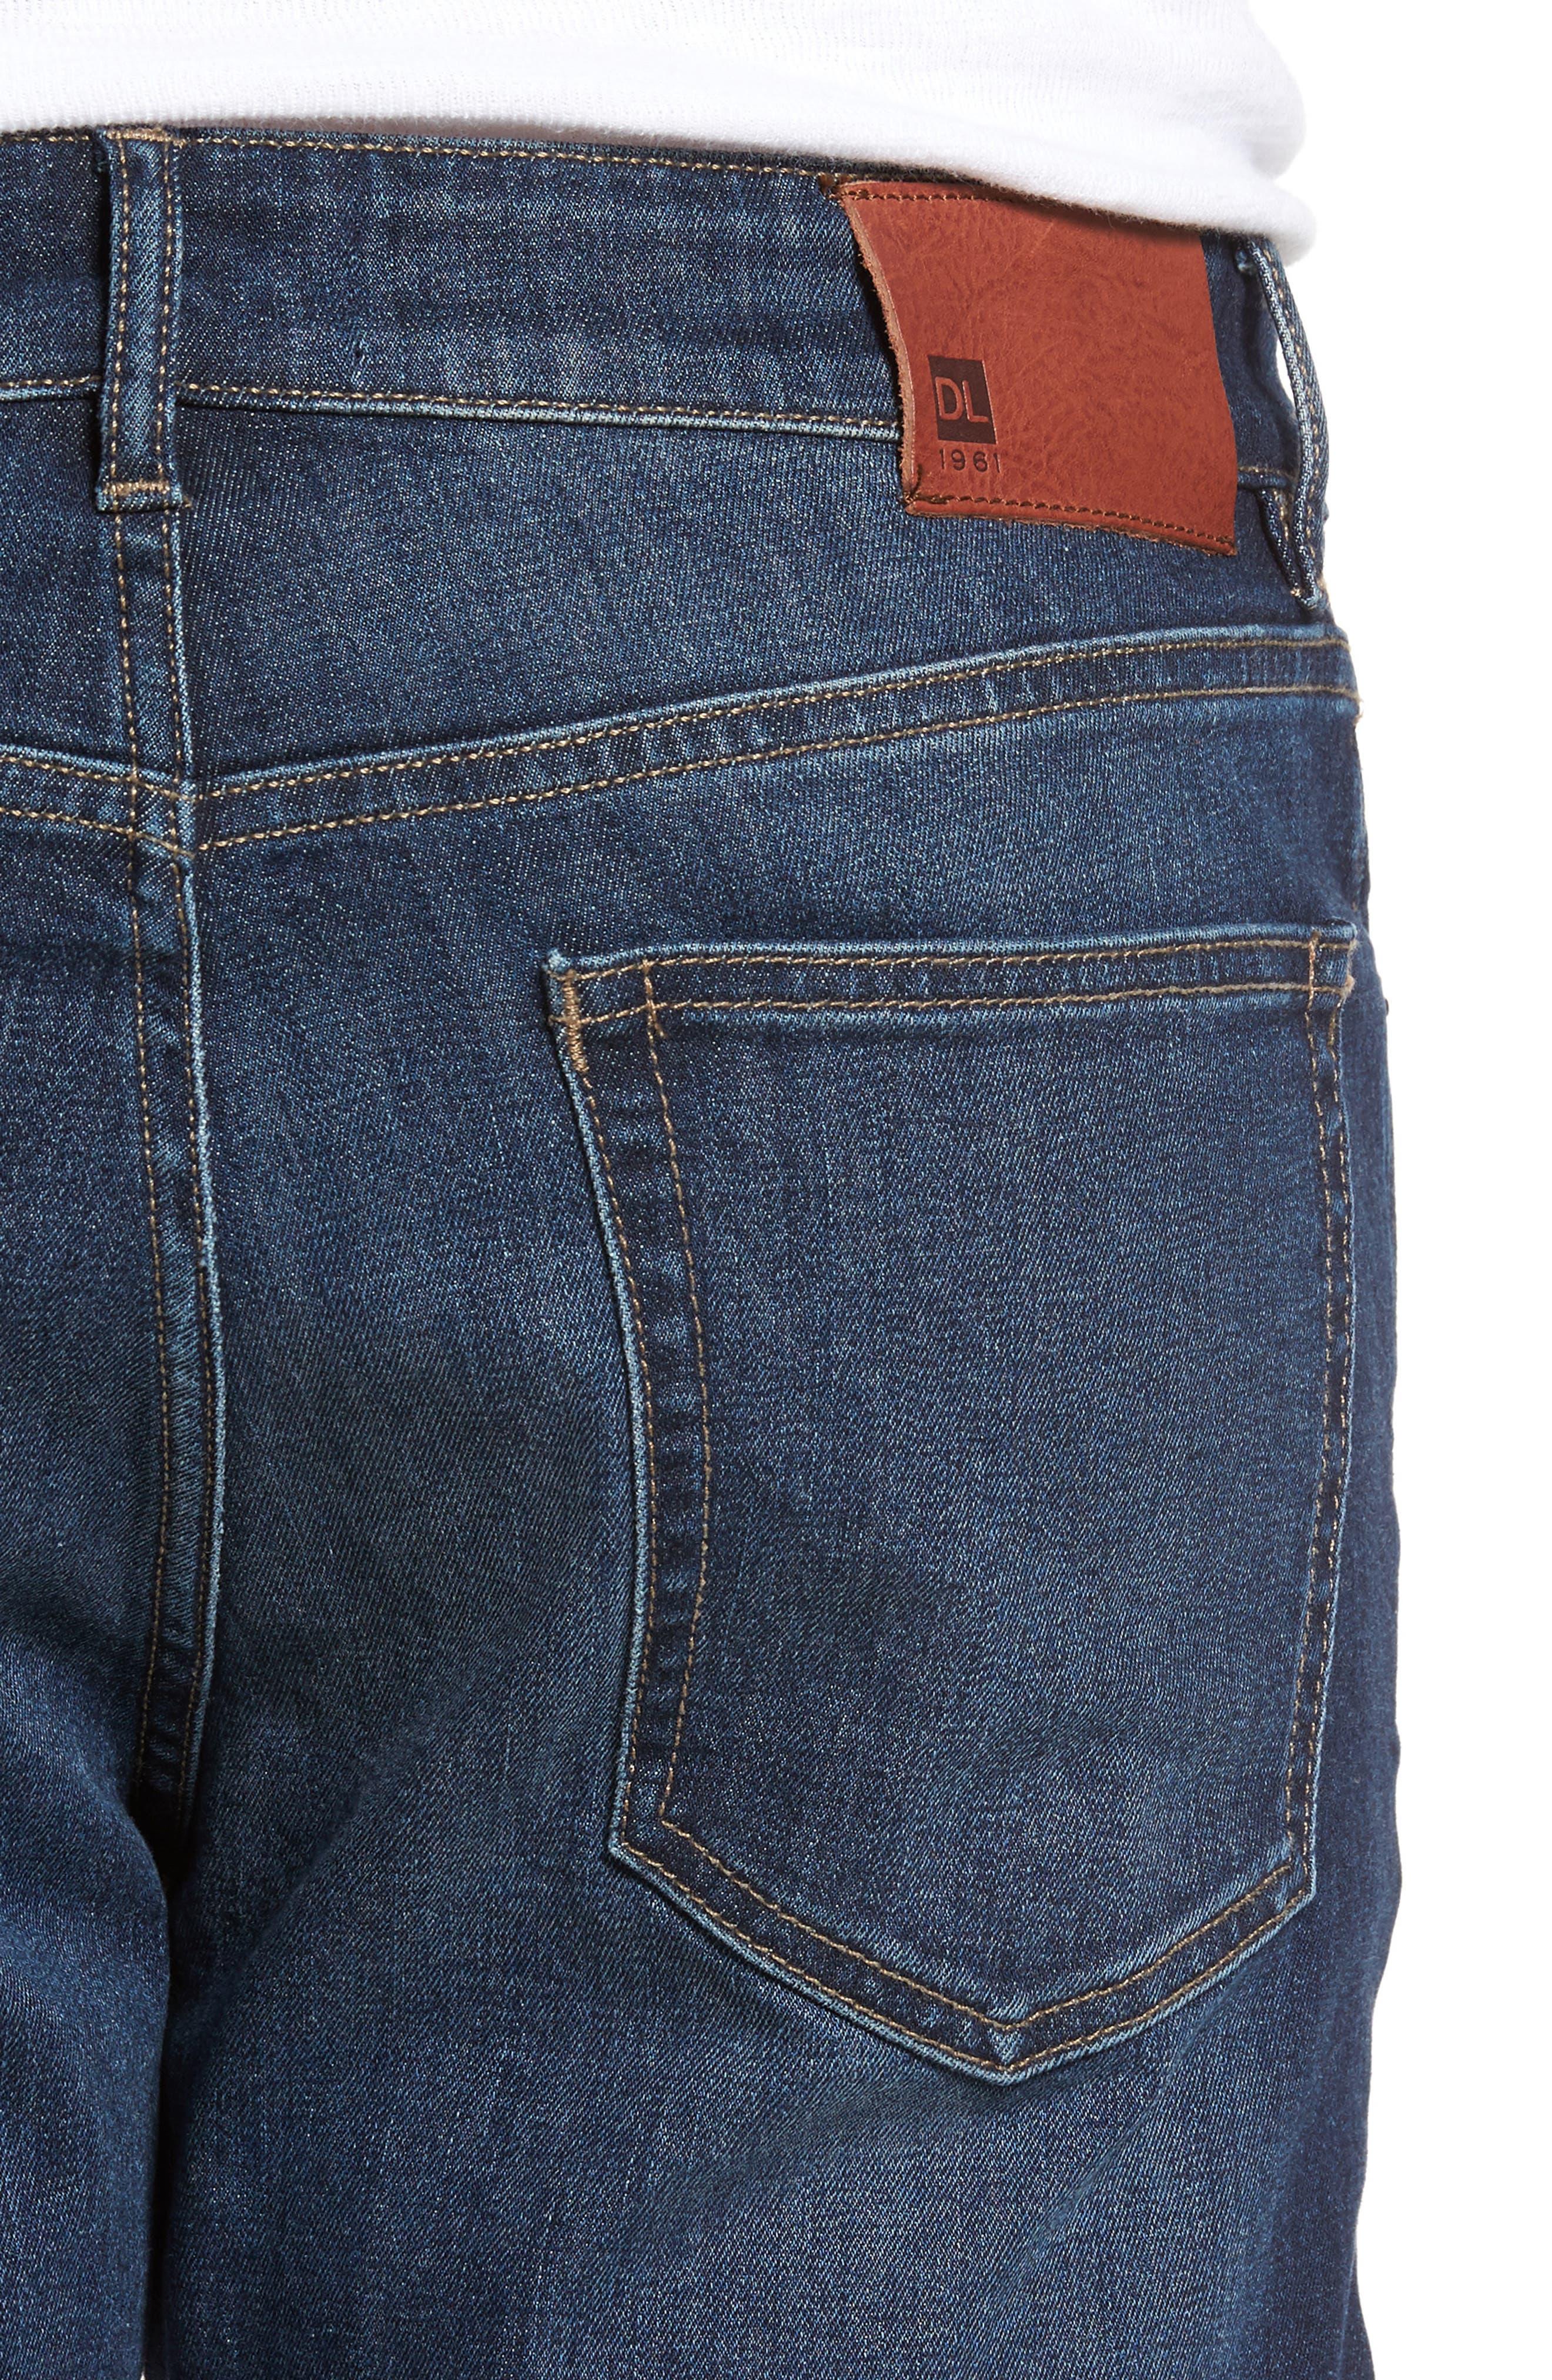 Russell Slim Straight Leg Jeans,                             Alternate thumbnail 4, color,                             425